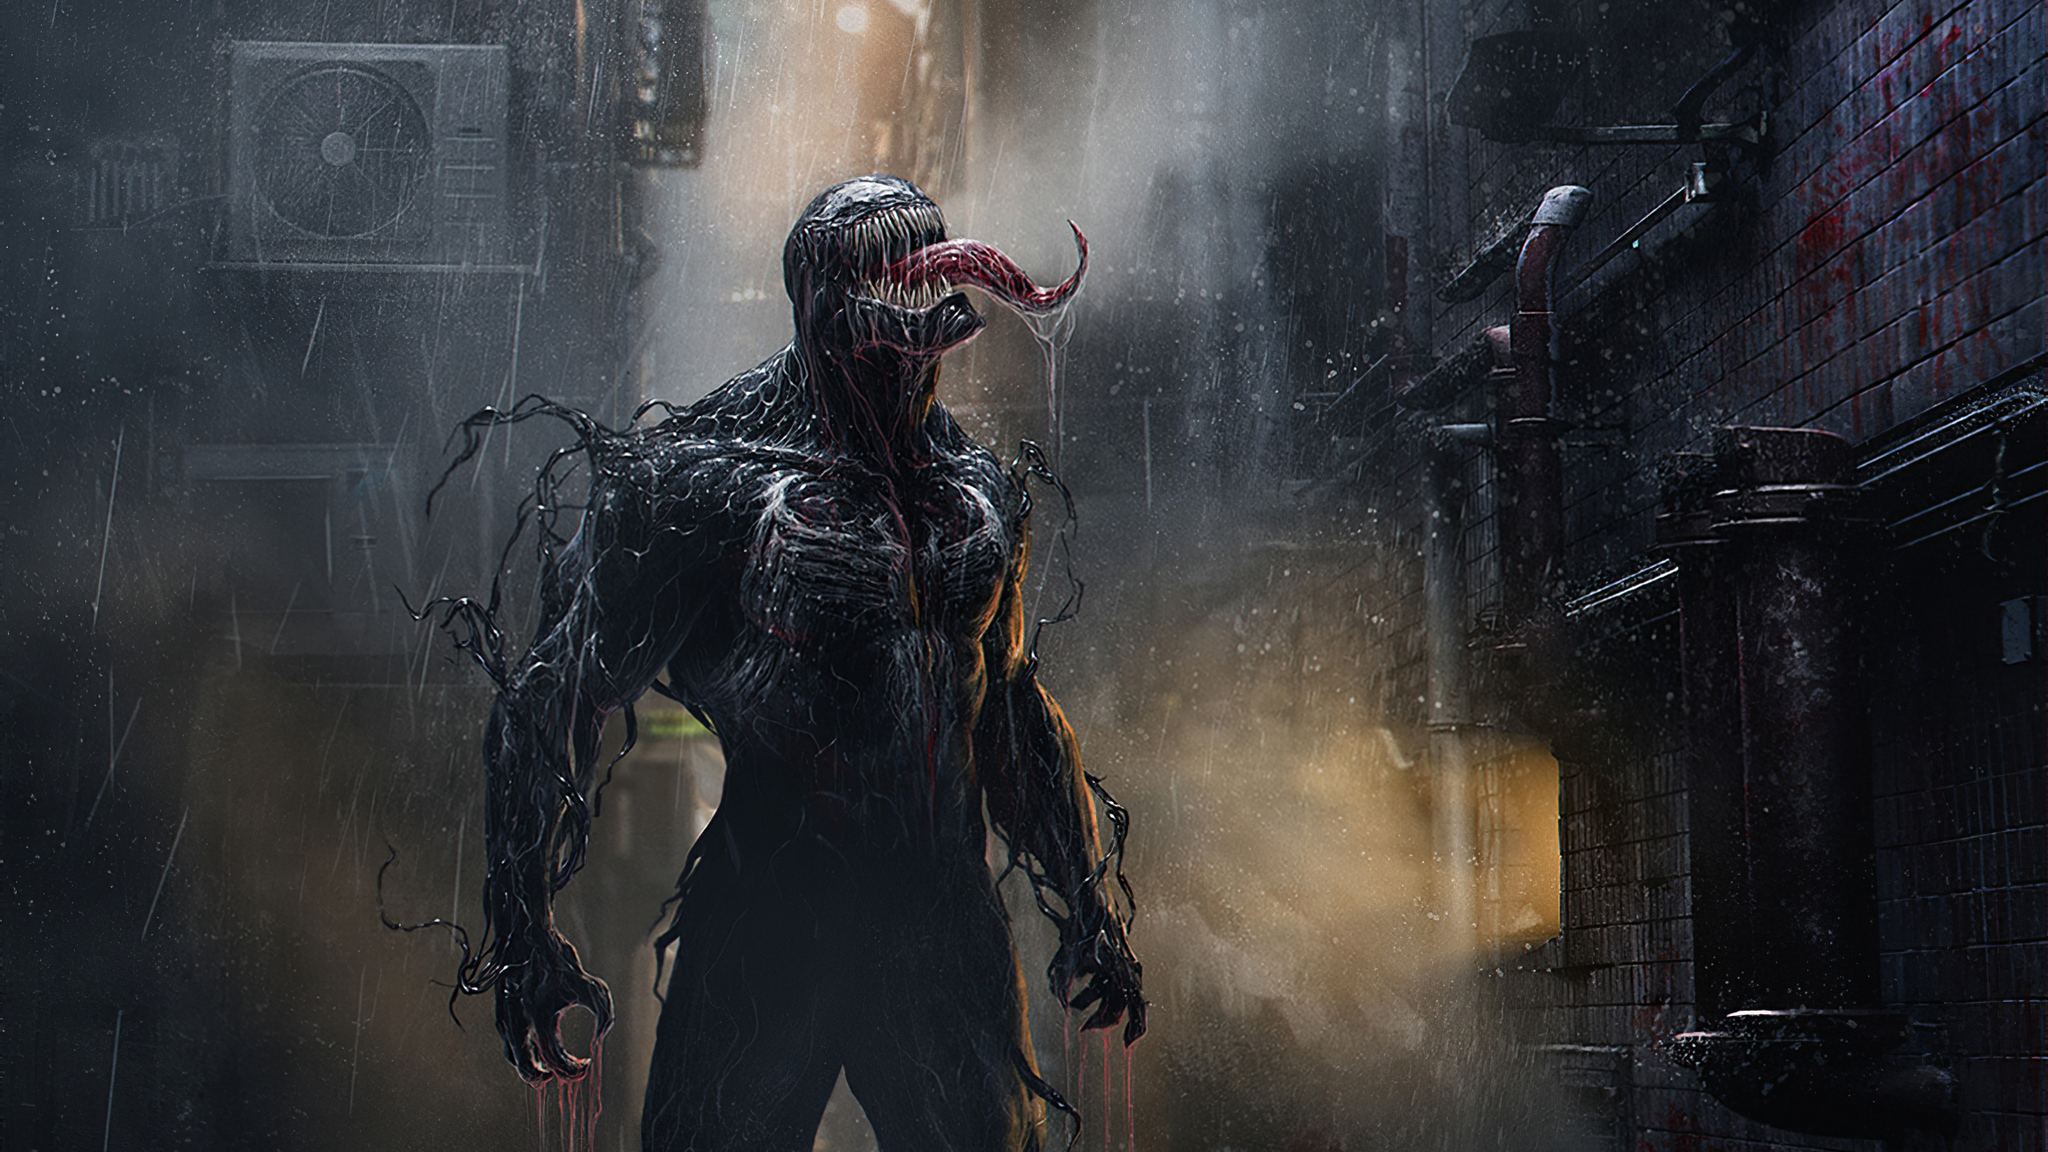 2048x1152 Venom In Rain 2048x1152 Resolution HD 4k ...